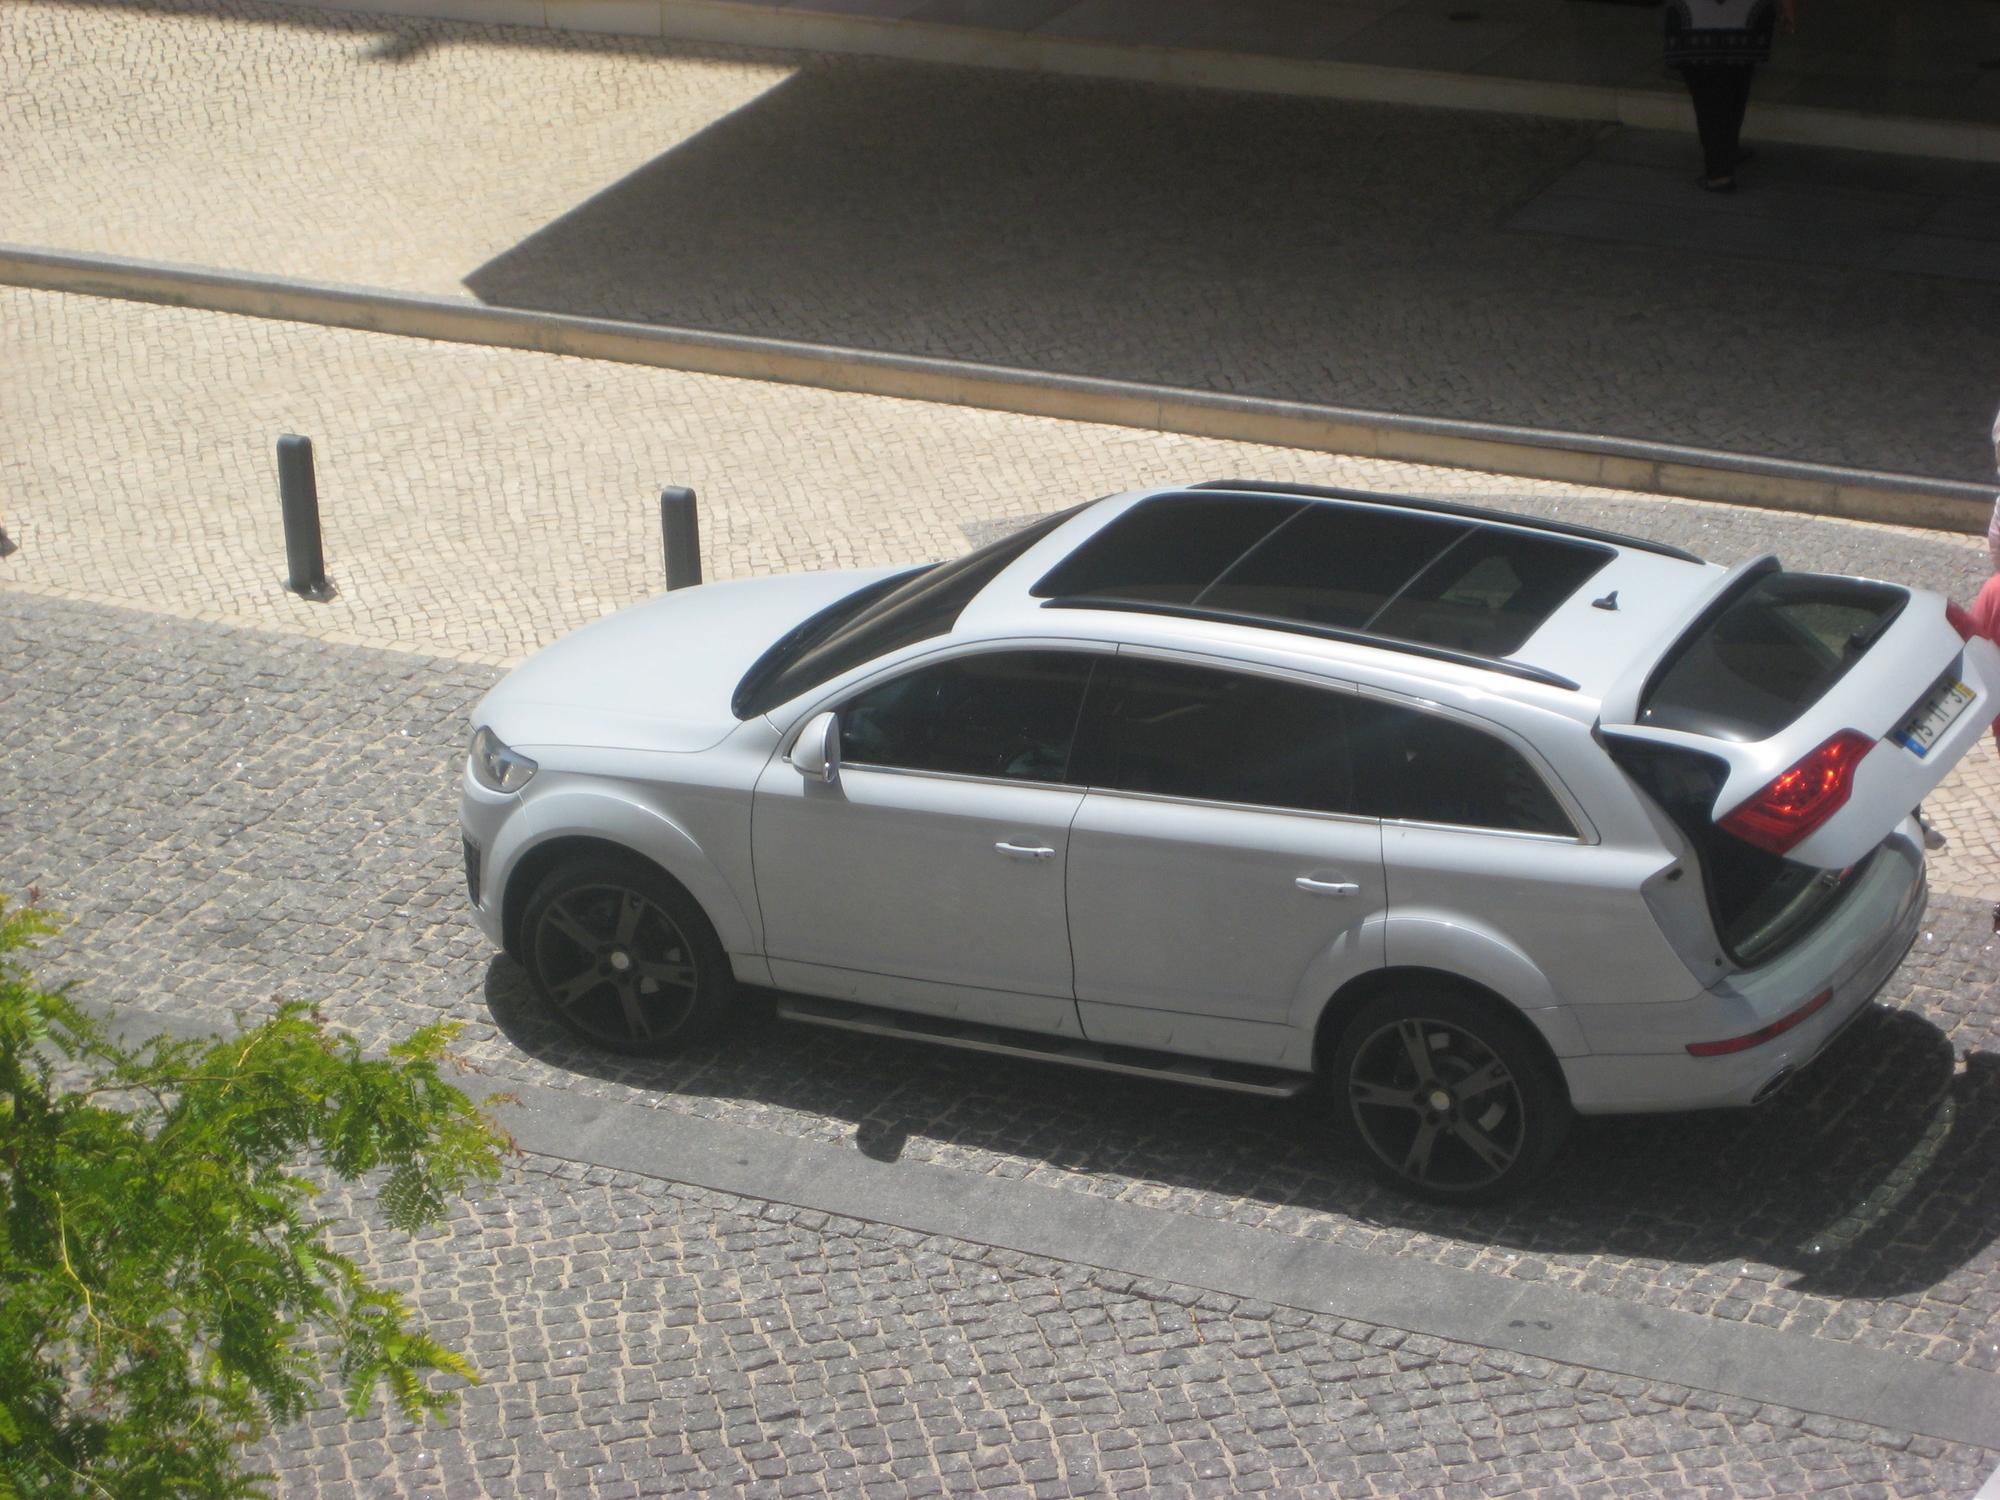 Audi Q7 6 0 V12 Tdi Quattro Exclusive Slideshow